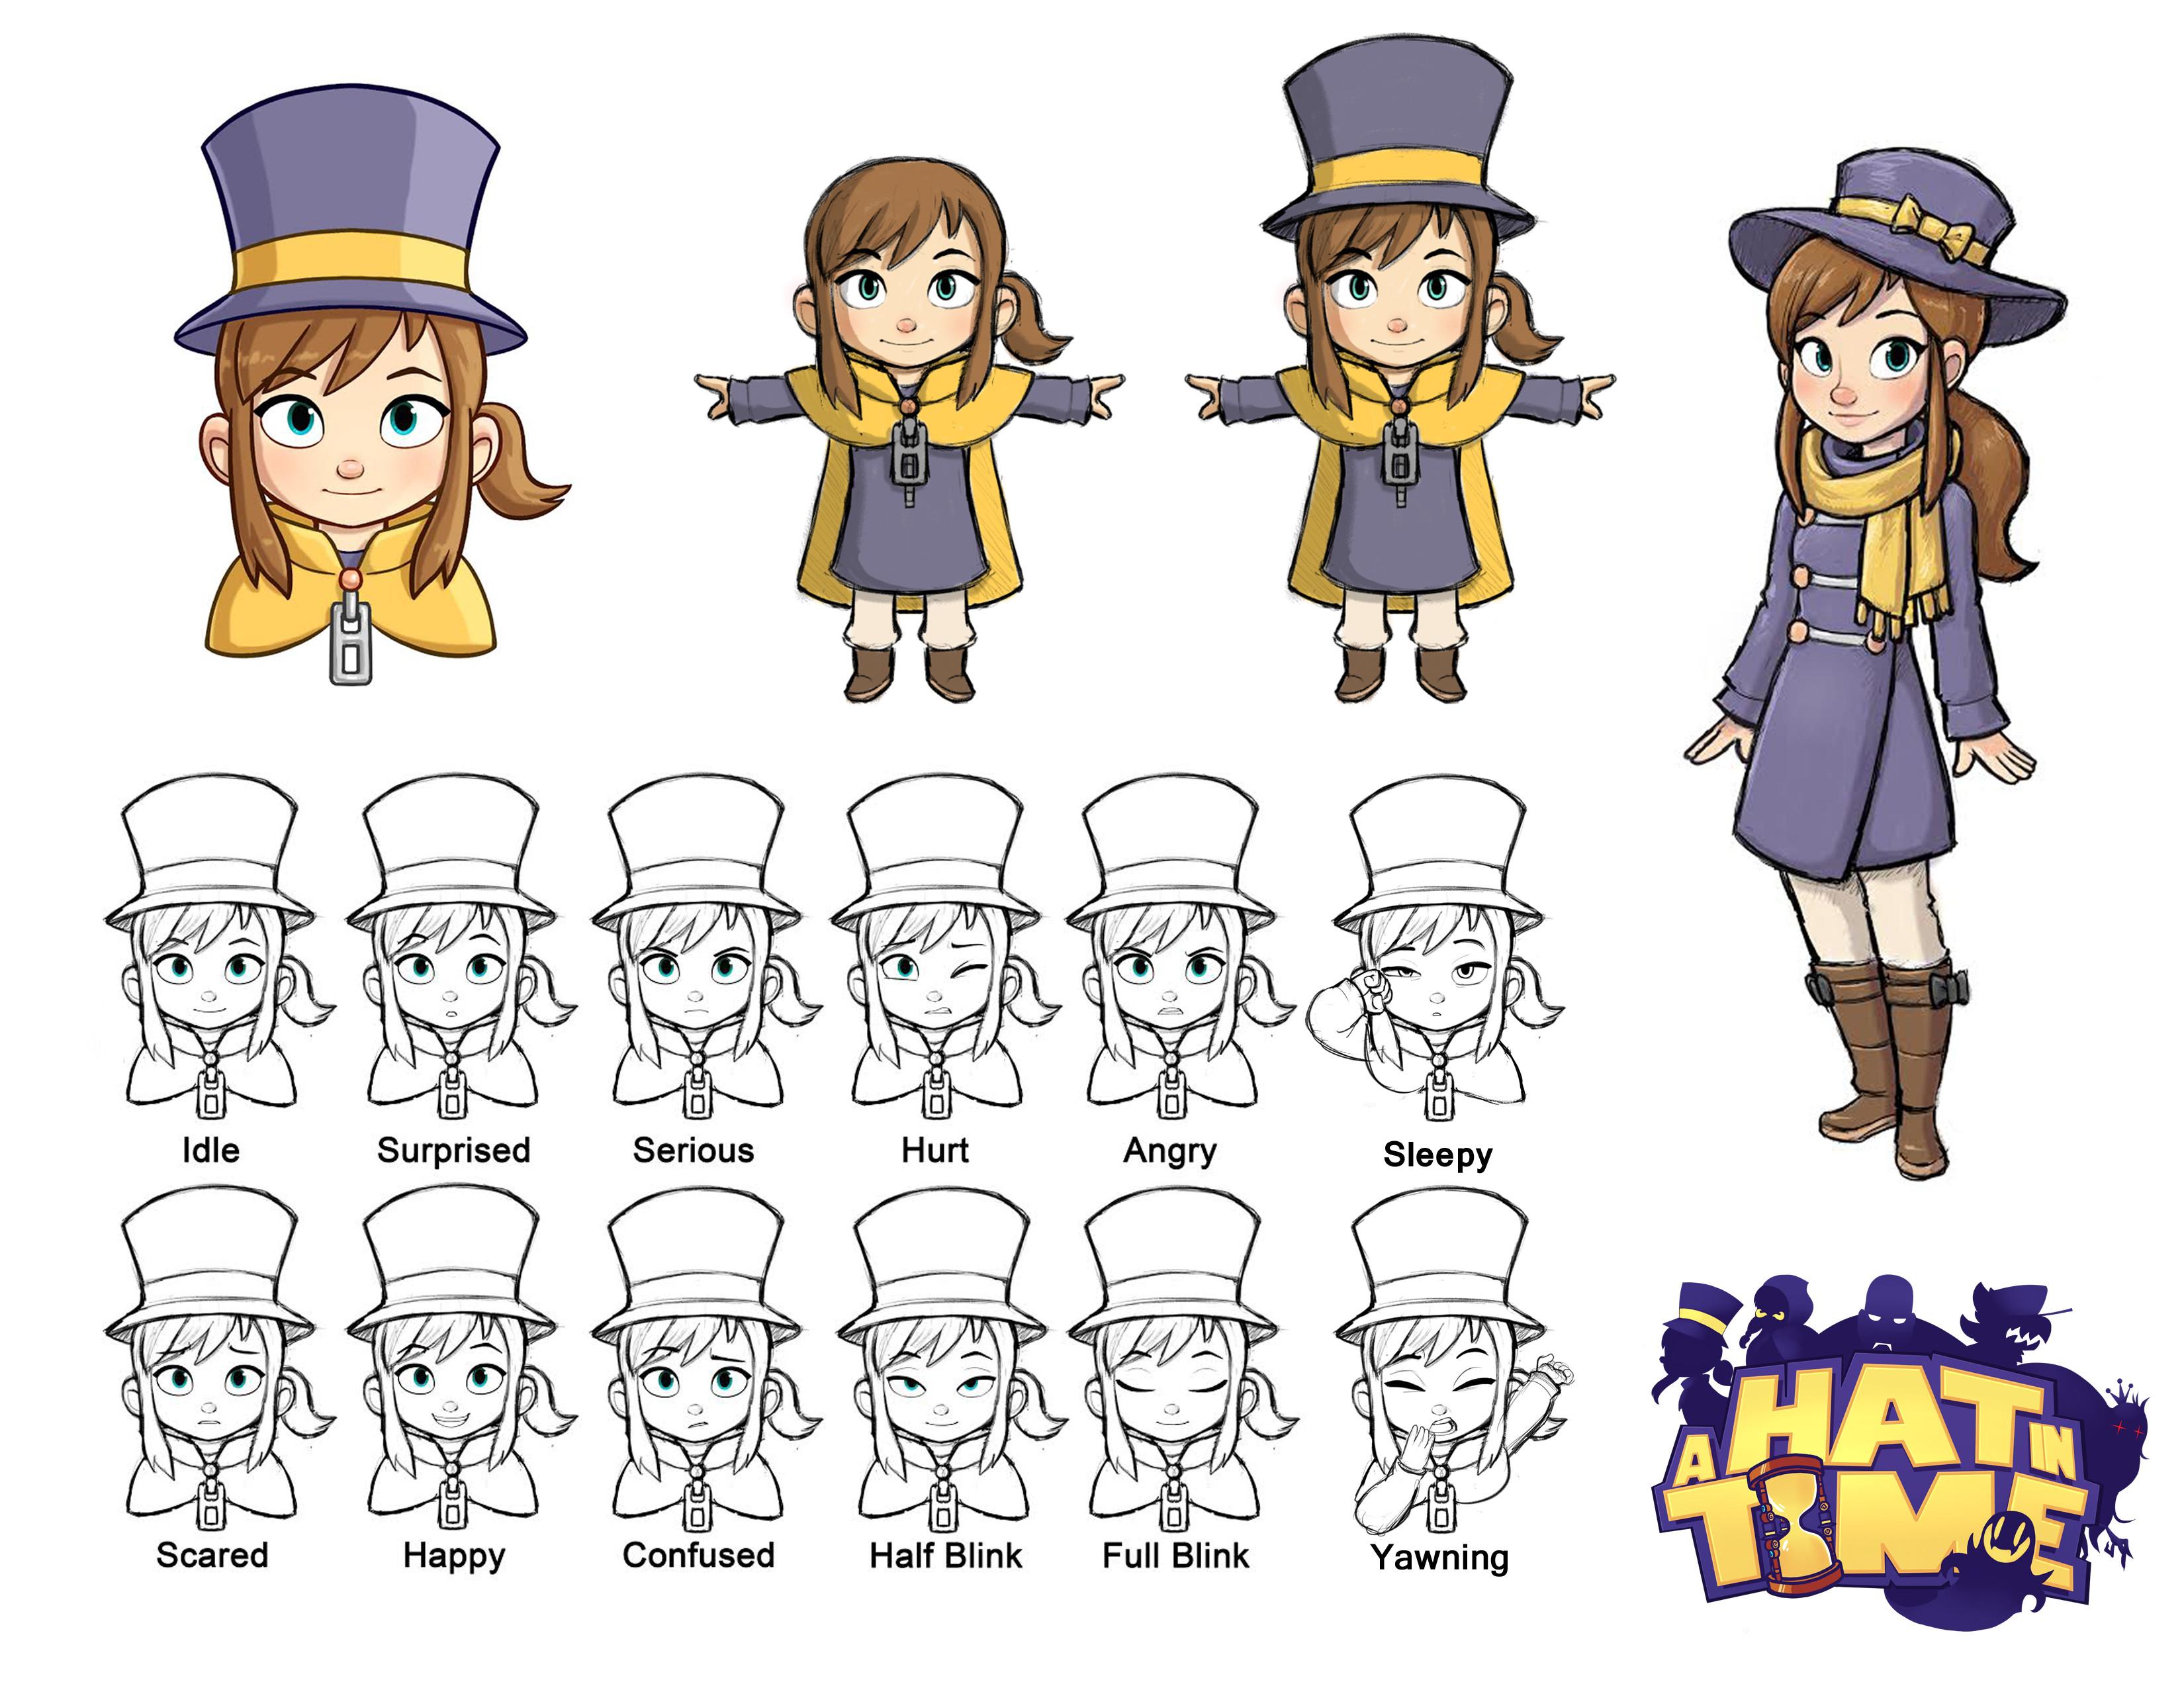 Hat Kid Character Design